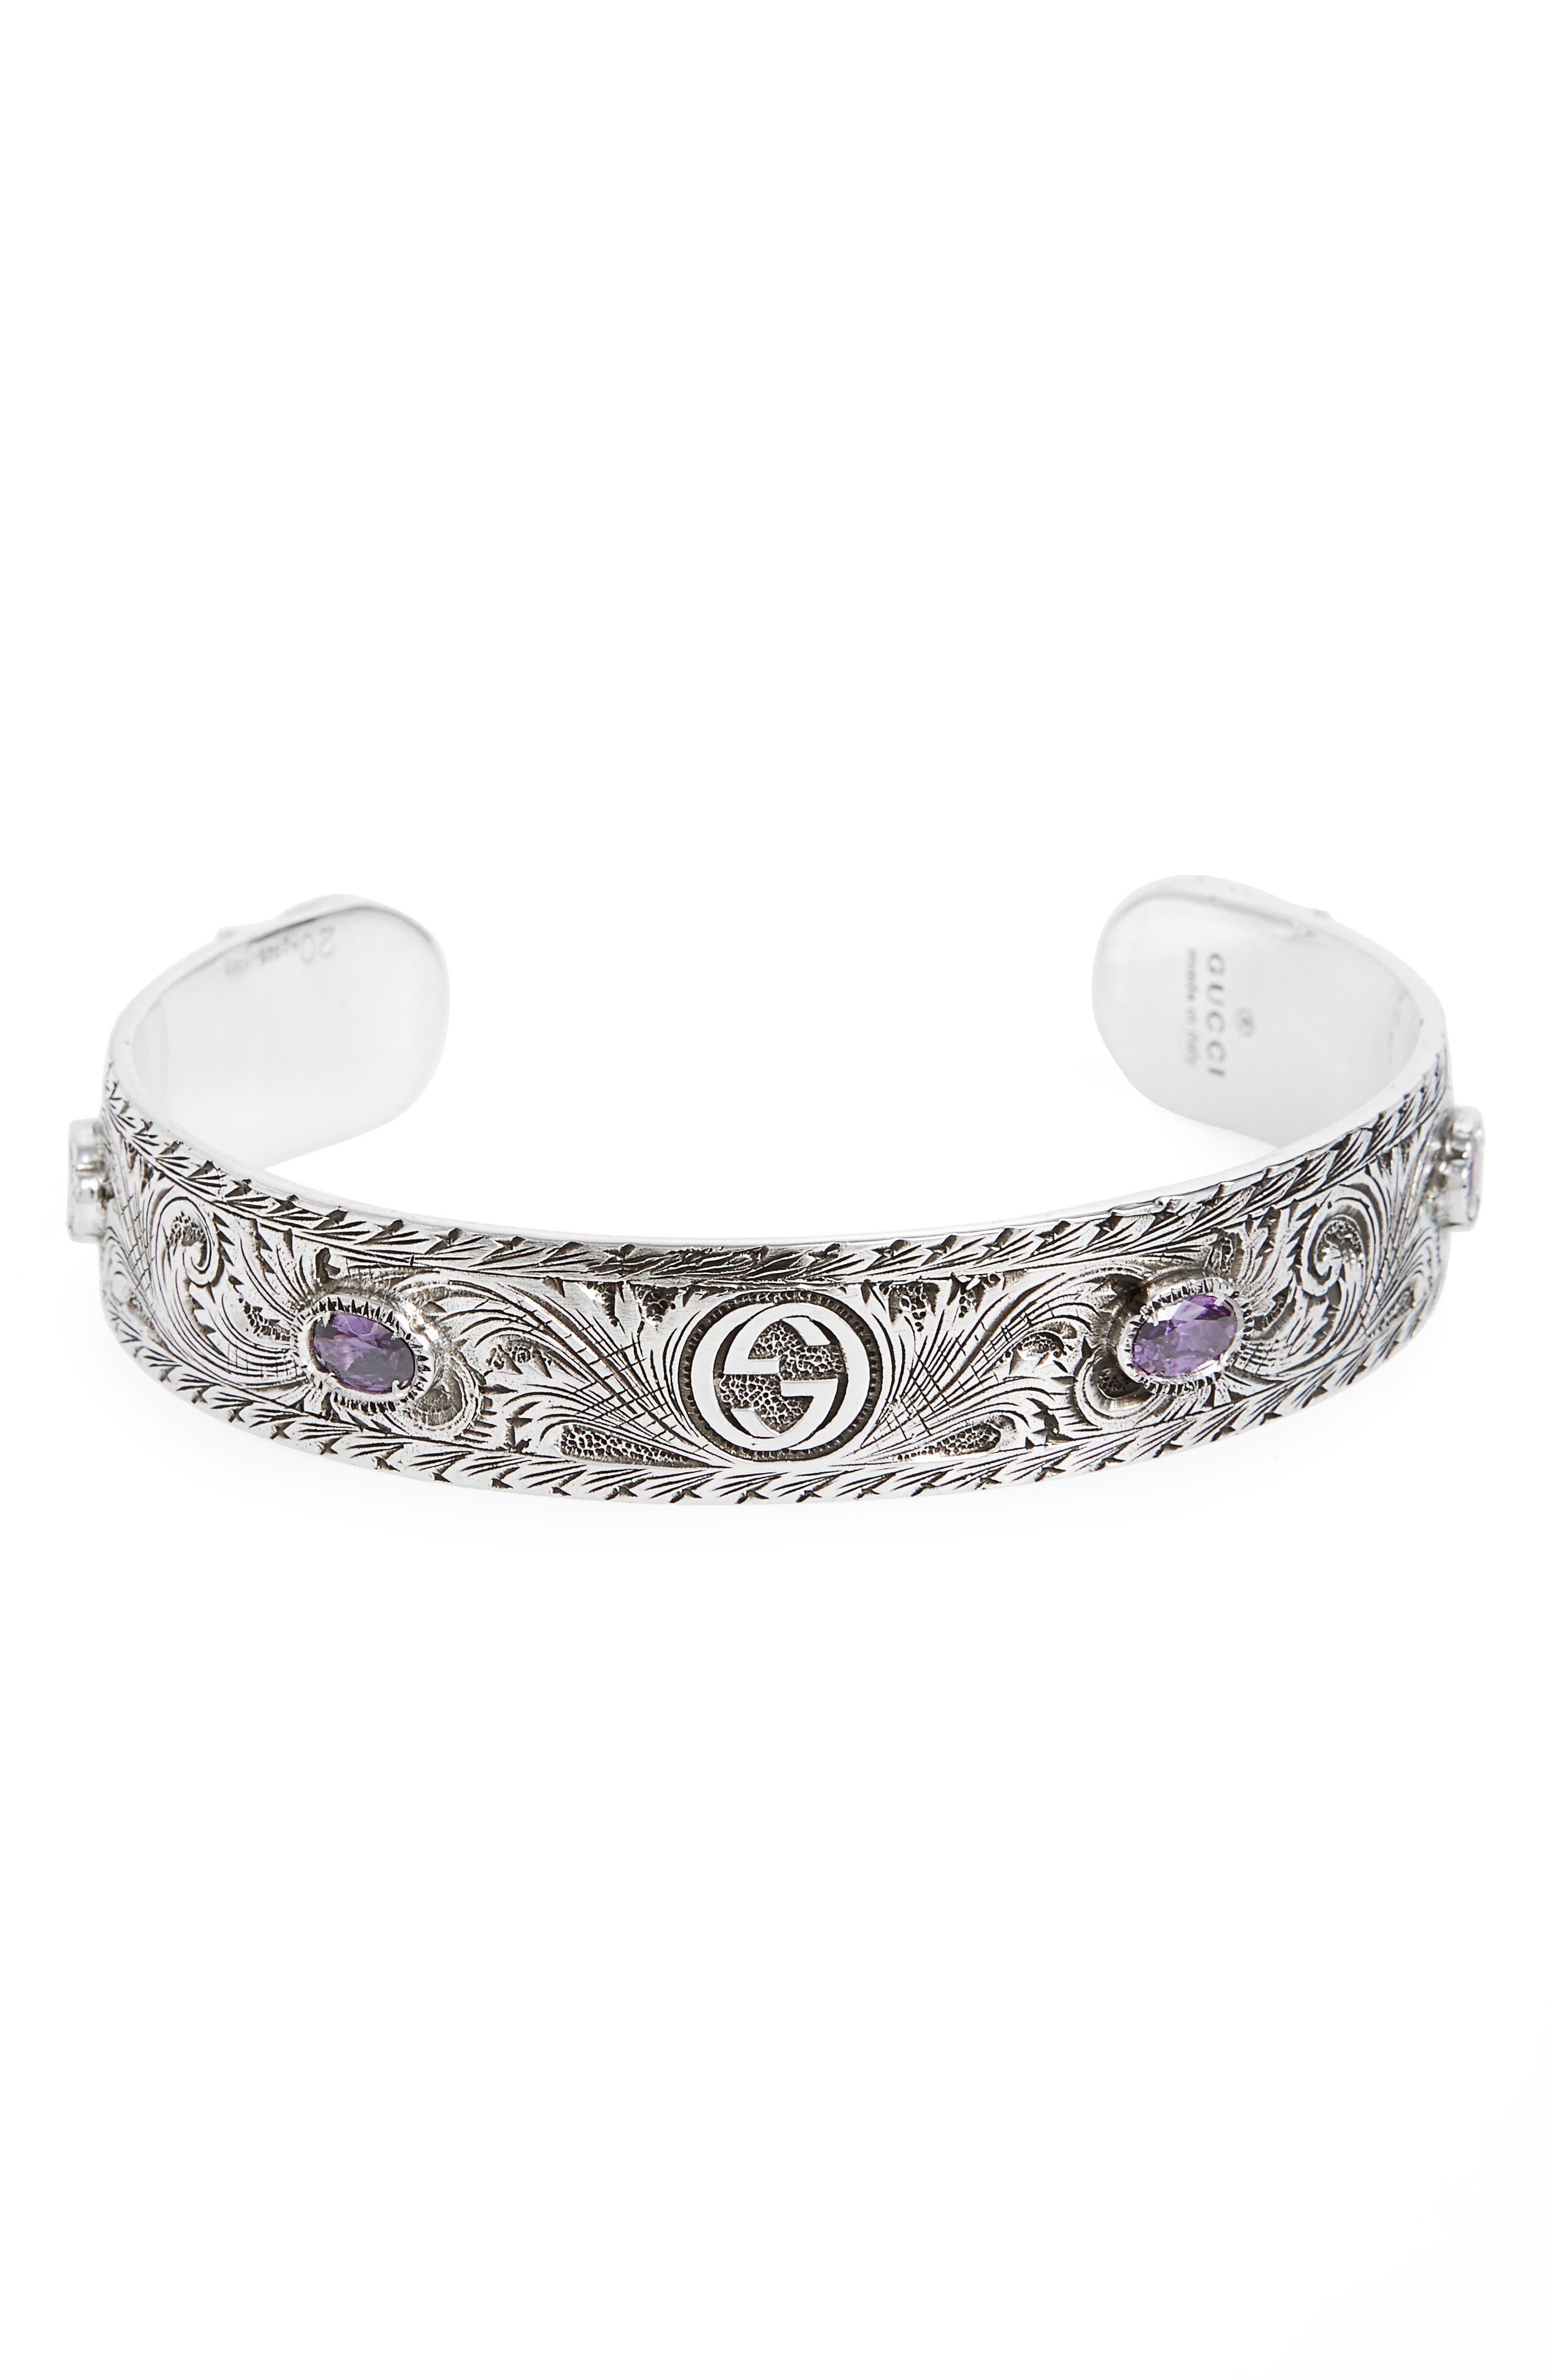 Garden Cuff Bracelet,                         Main,                         color, Silver